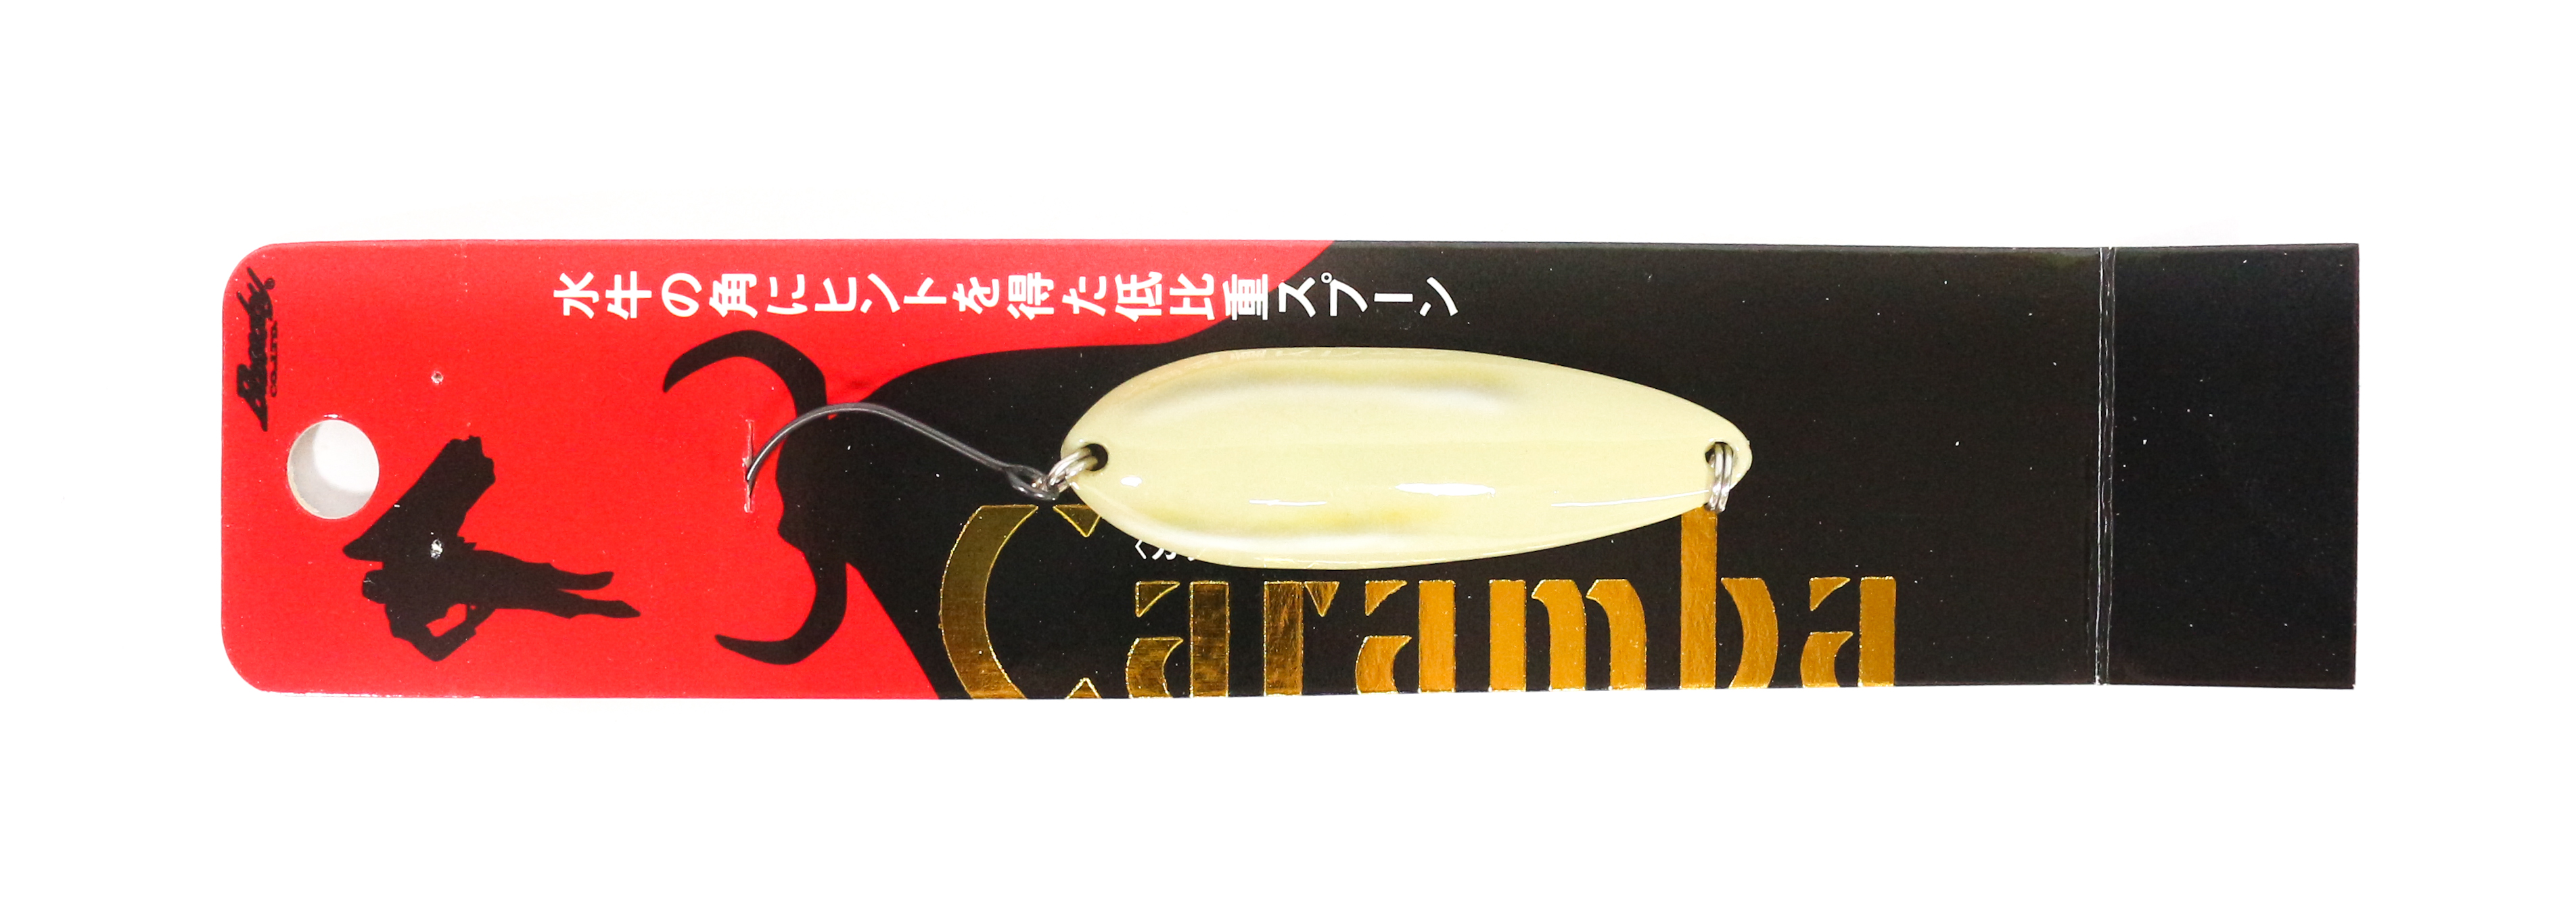 Sale Bassday Caramba 50 Spoon 3 grams 101 (3018)